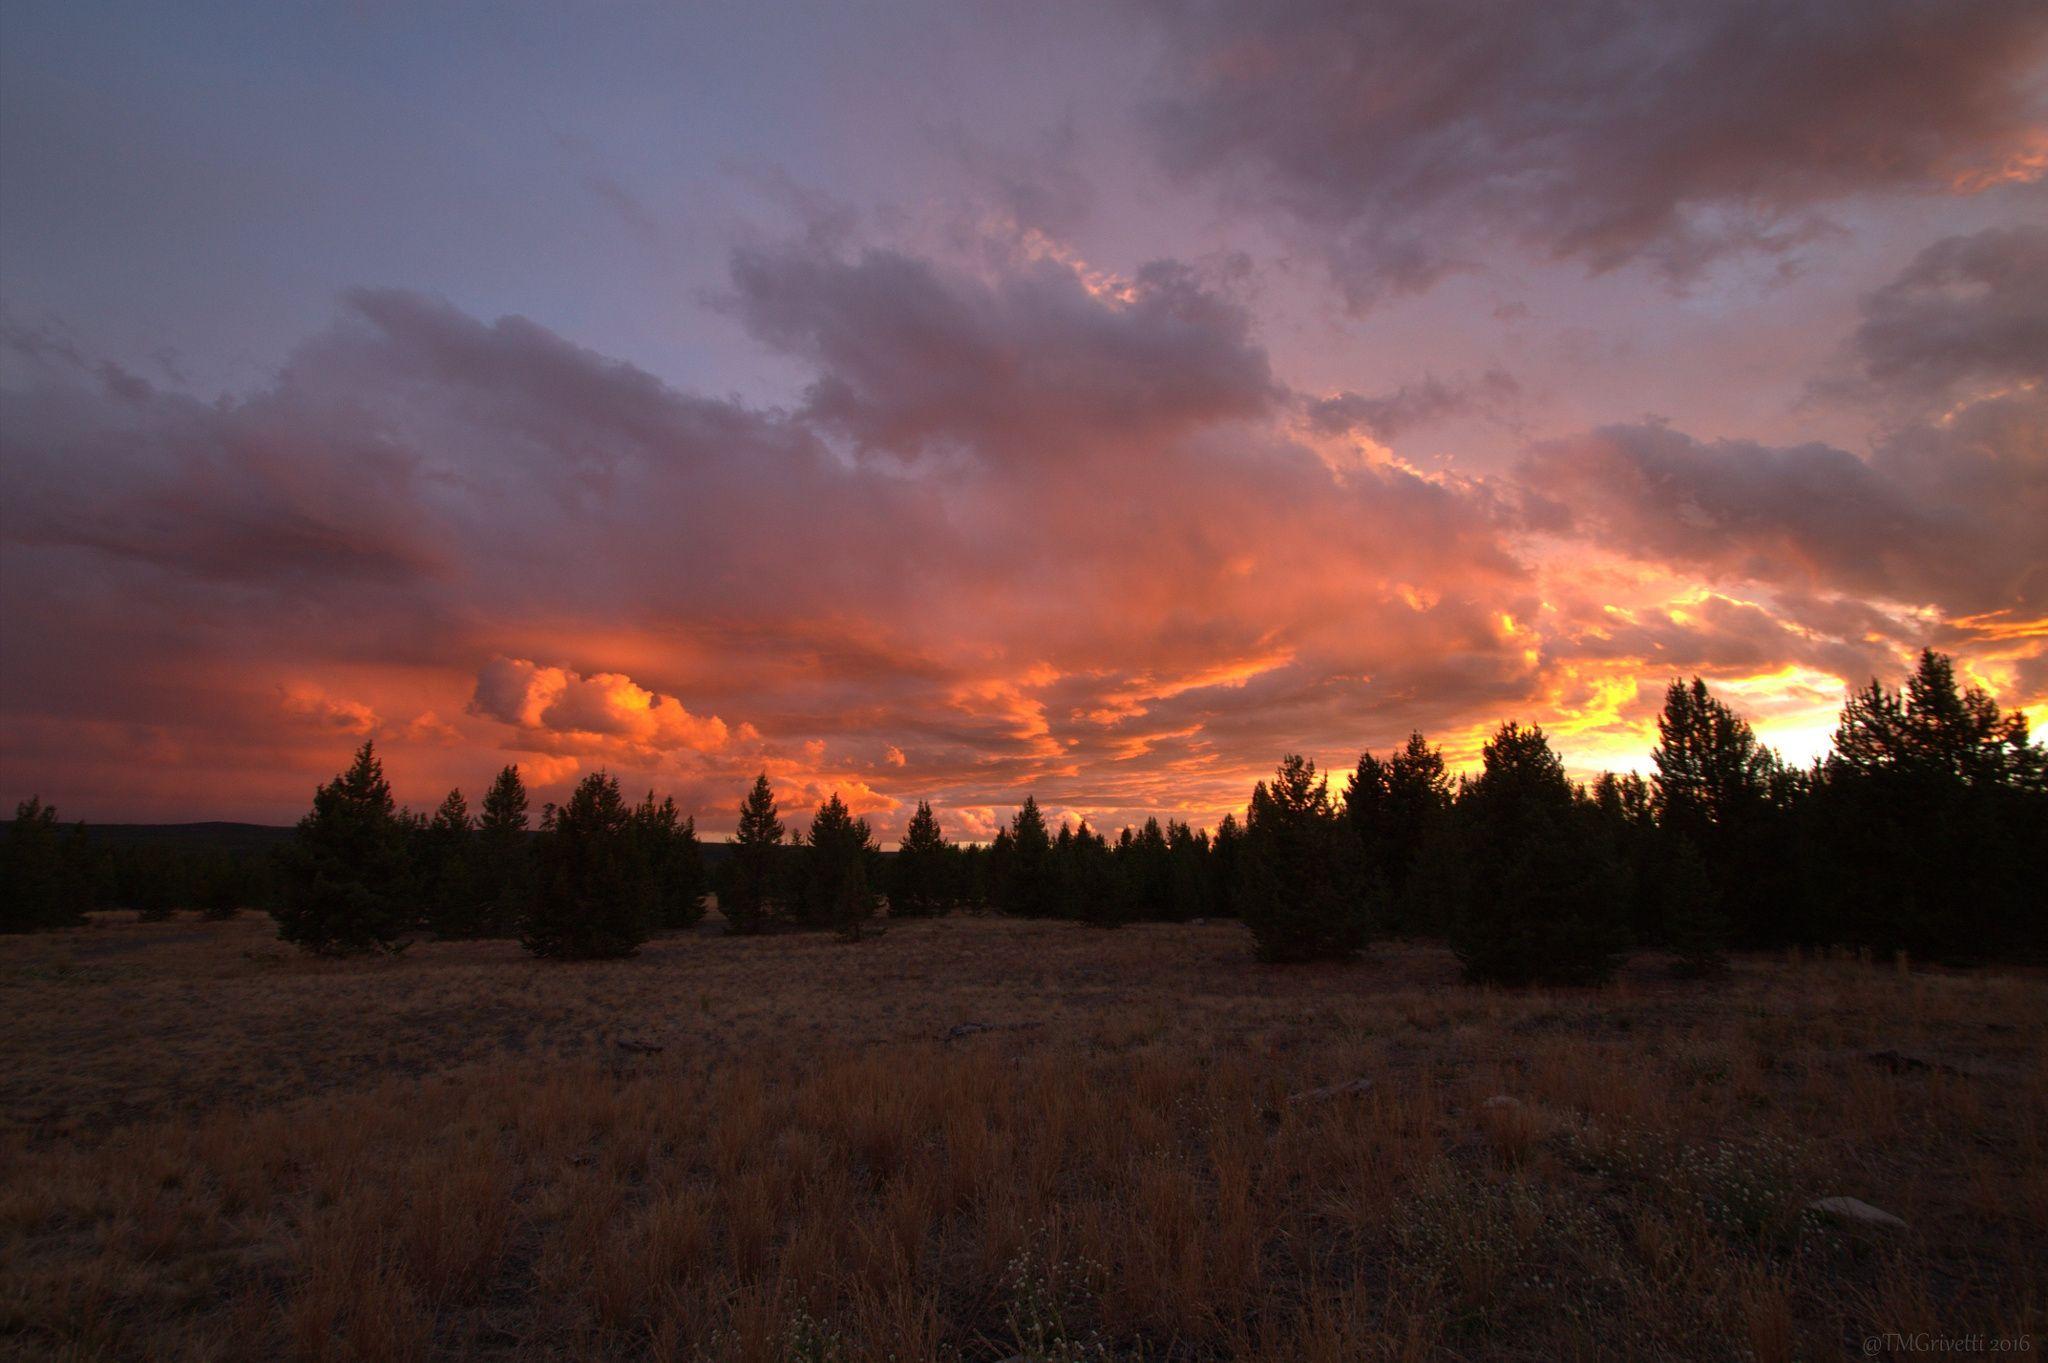 Wild Montana Sunset - West Yellowstone, MT - West Yellowstone, Montana. Sunset…